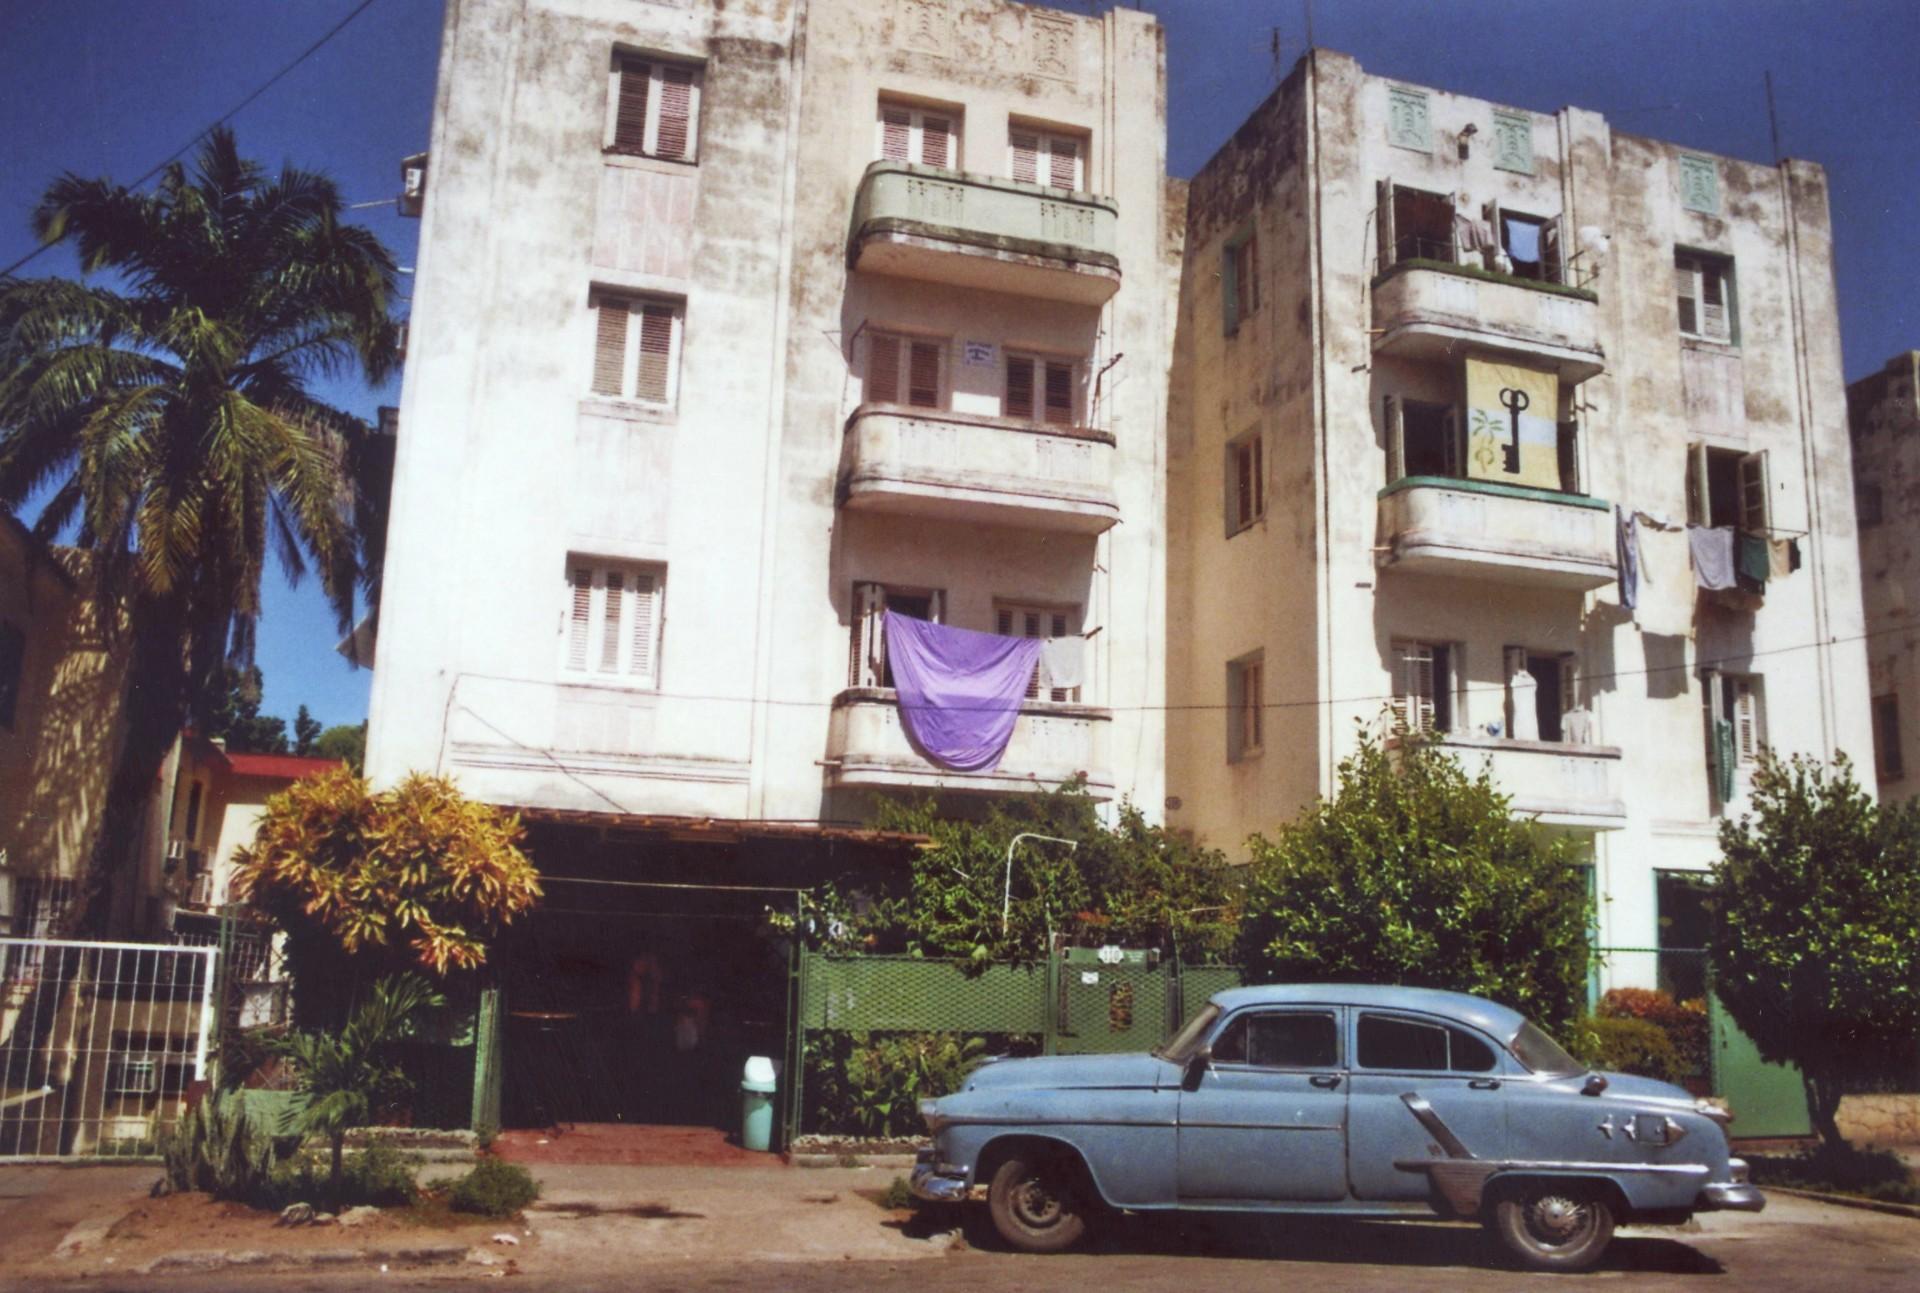 veraKoh. Cuba Analog